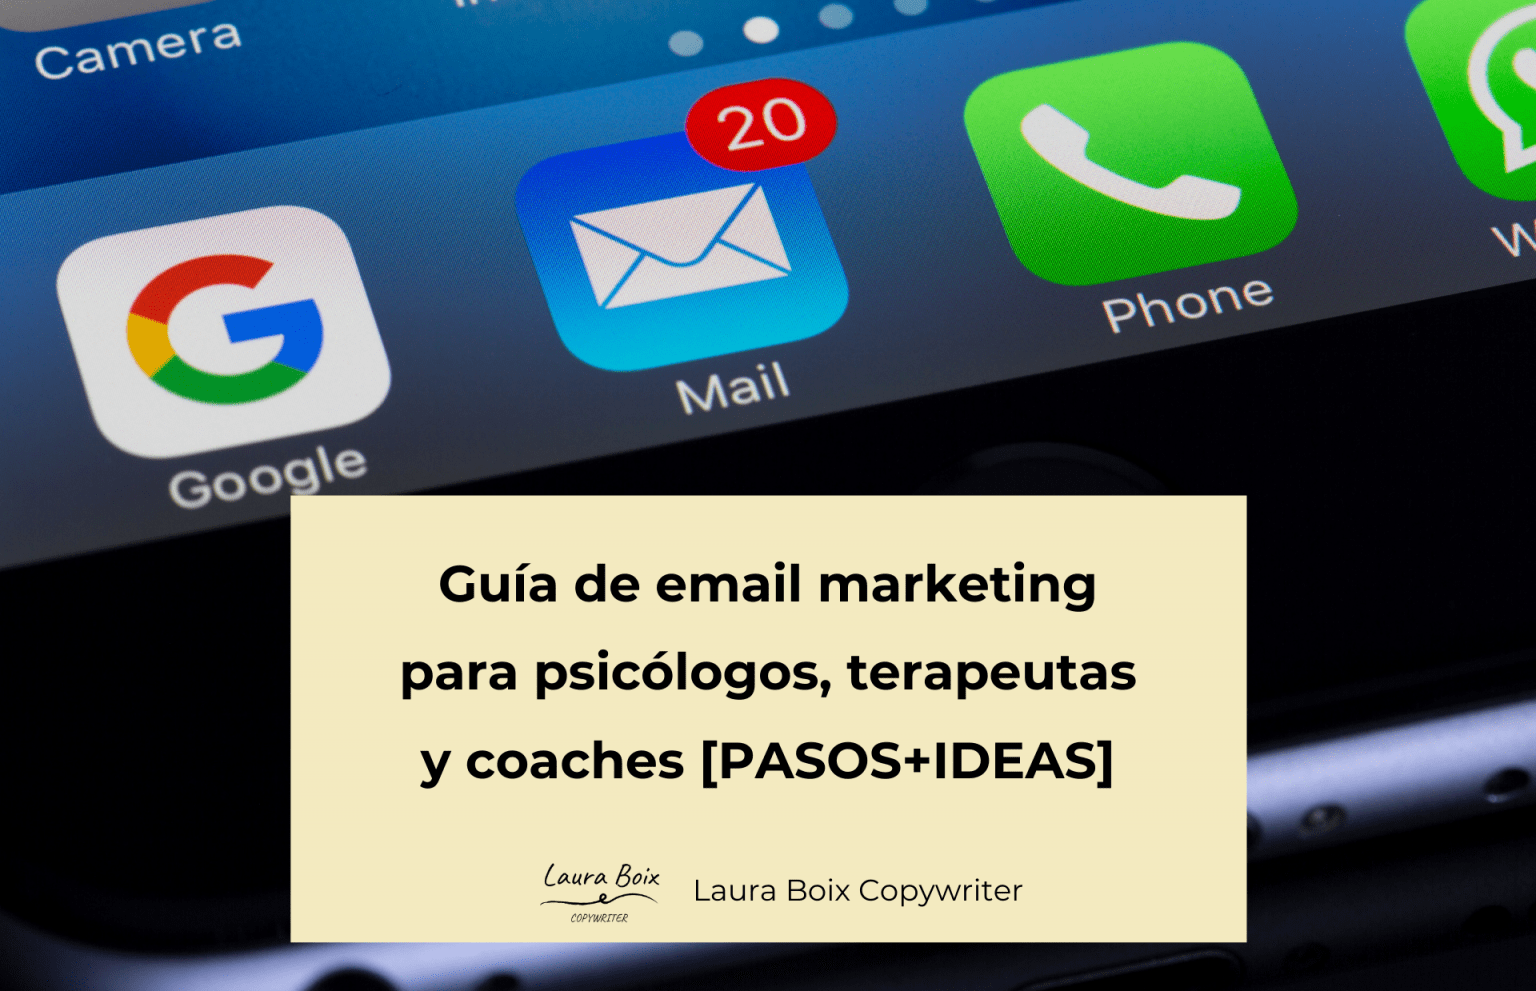 guía-email-marketing-psicologos-terapeutas-coaches